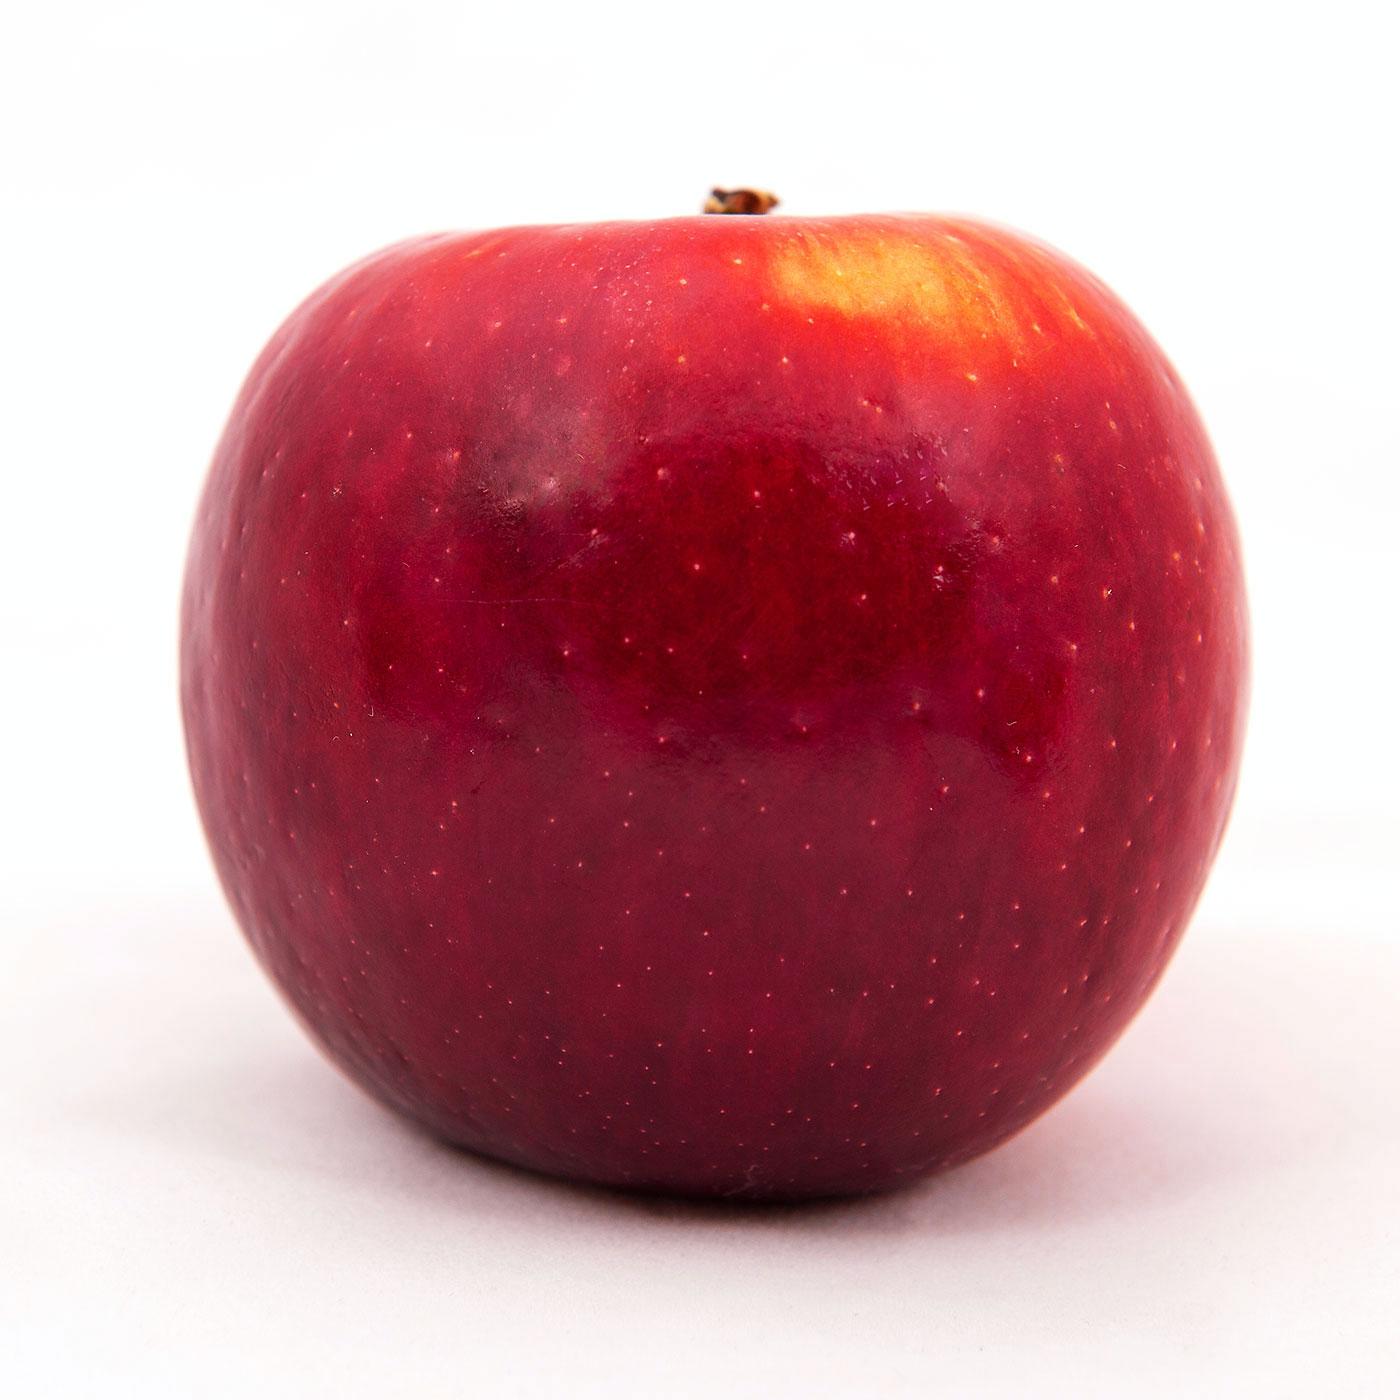 Studio photography of the Cosmic Crisp® apple